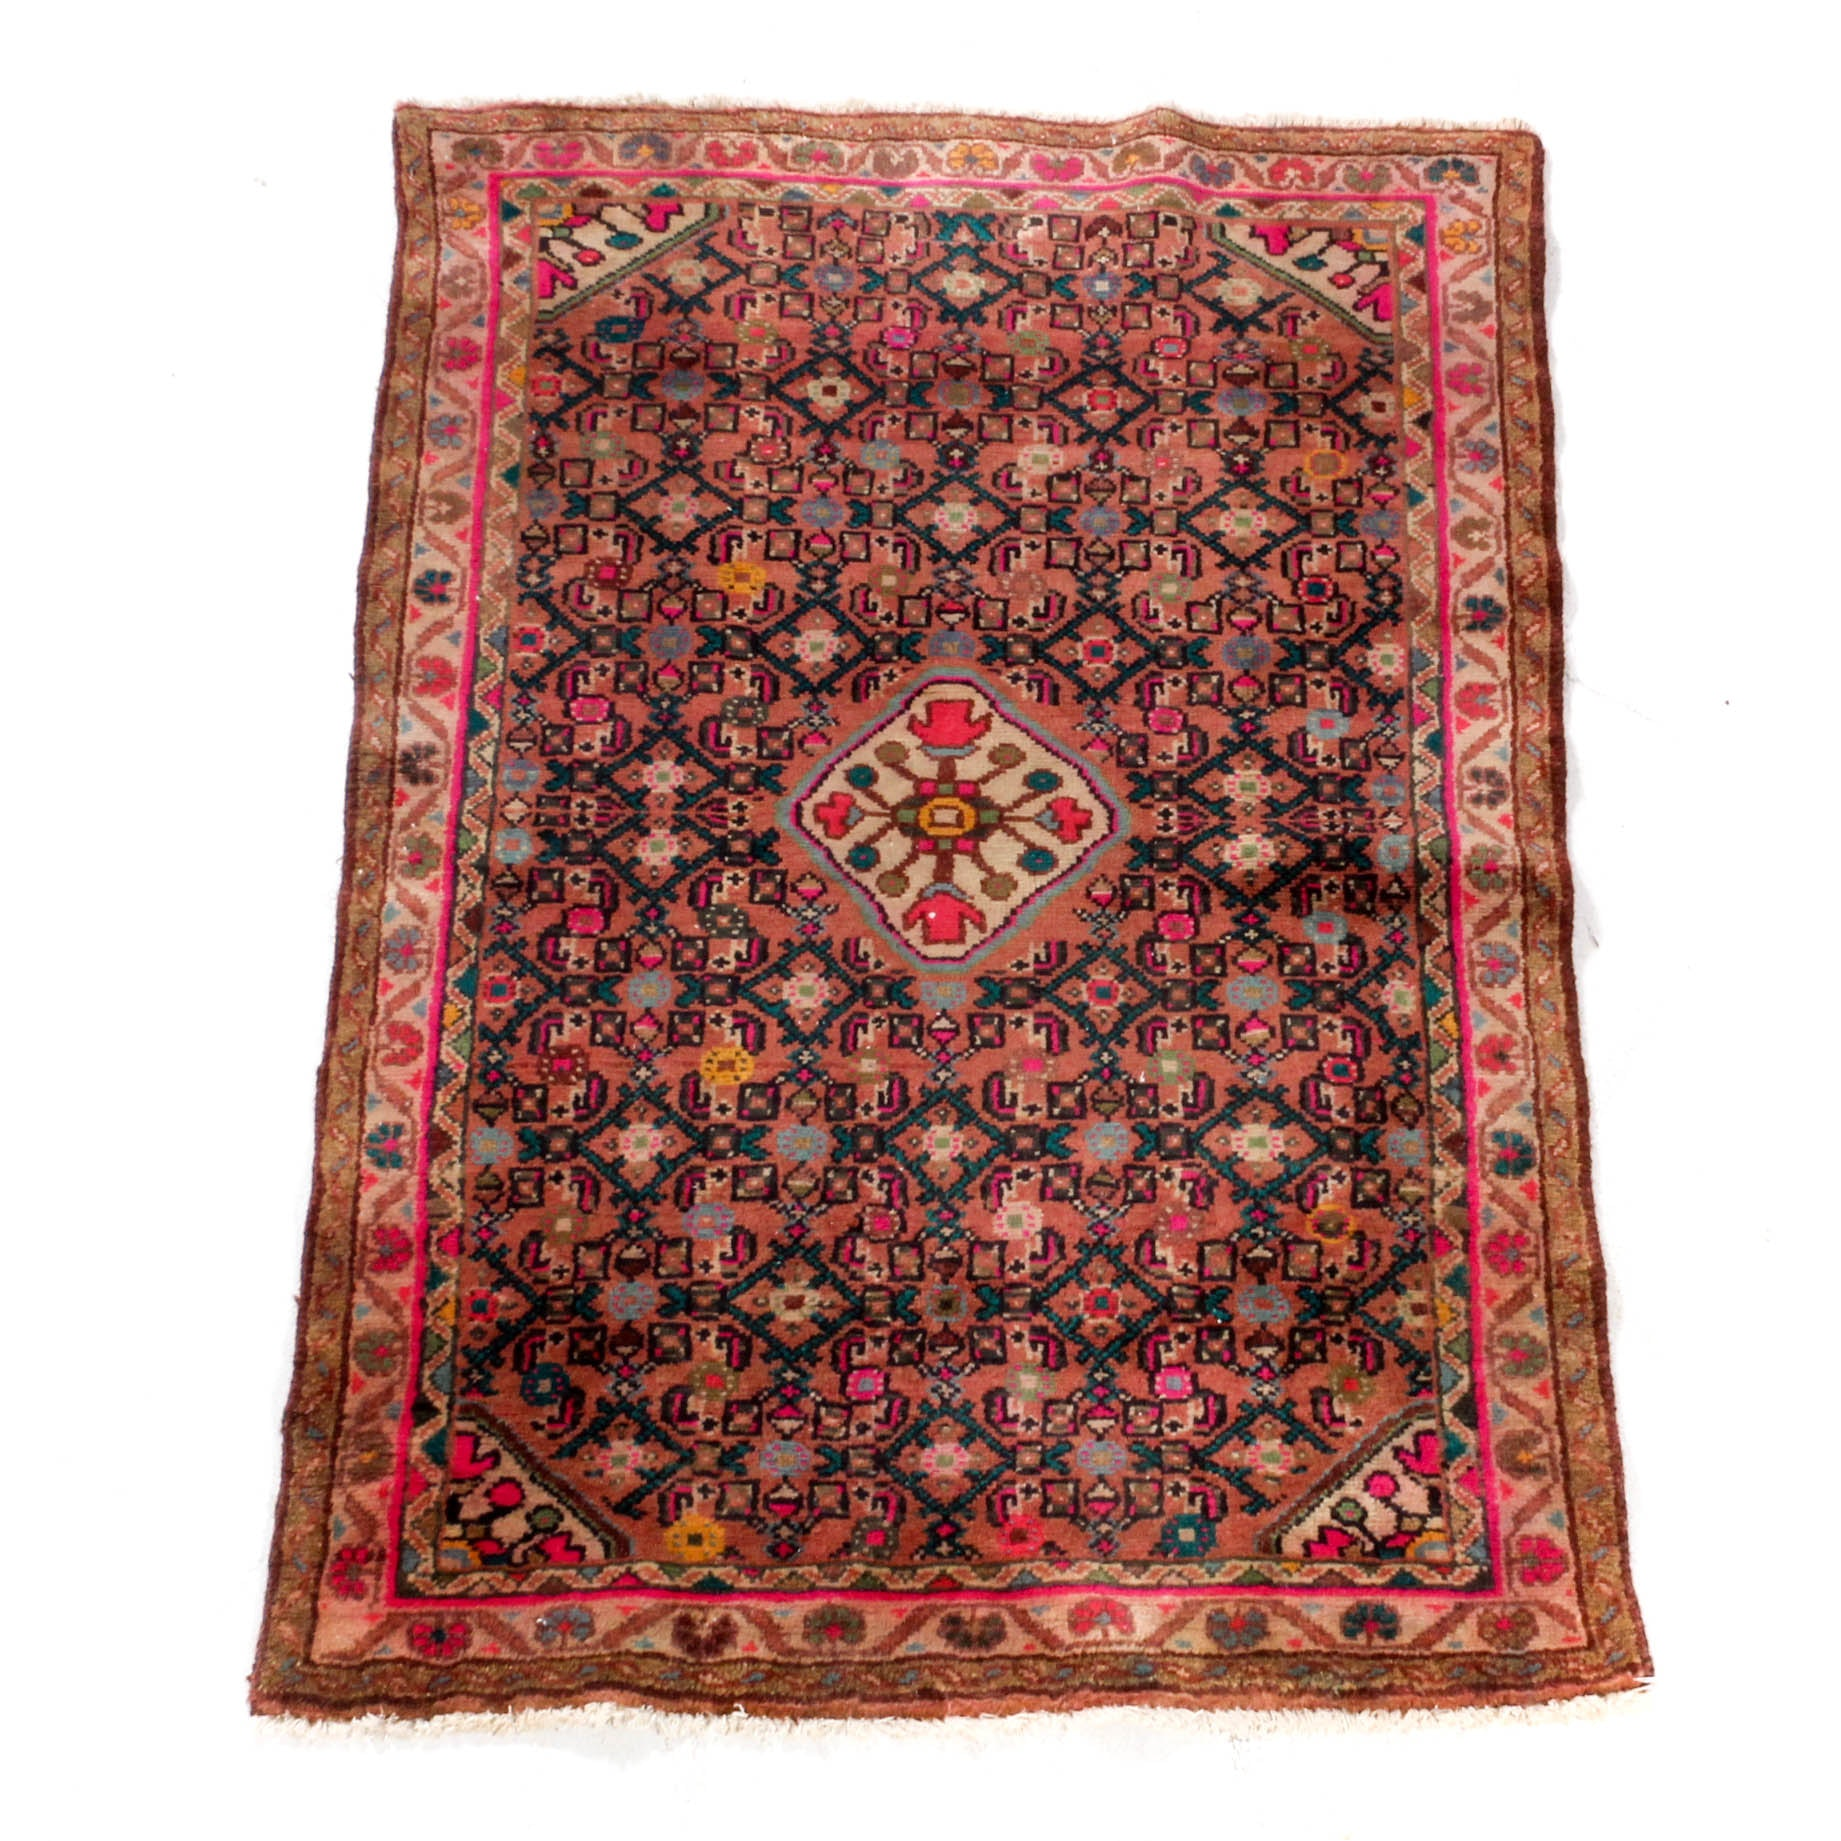 Semi-Antique Hand-Knotted Persian Lilihan Sarouk Rug